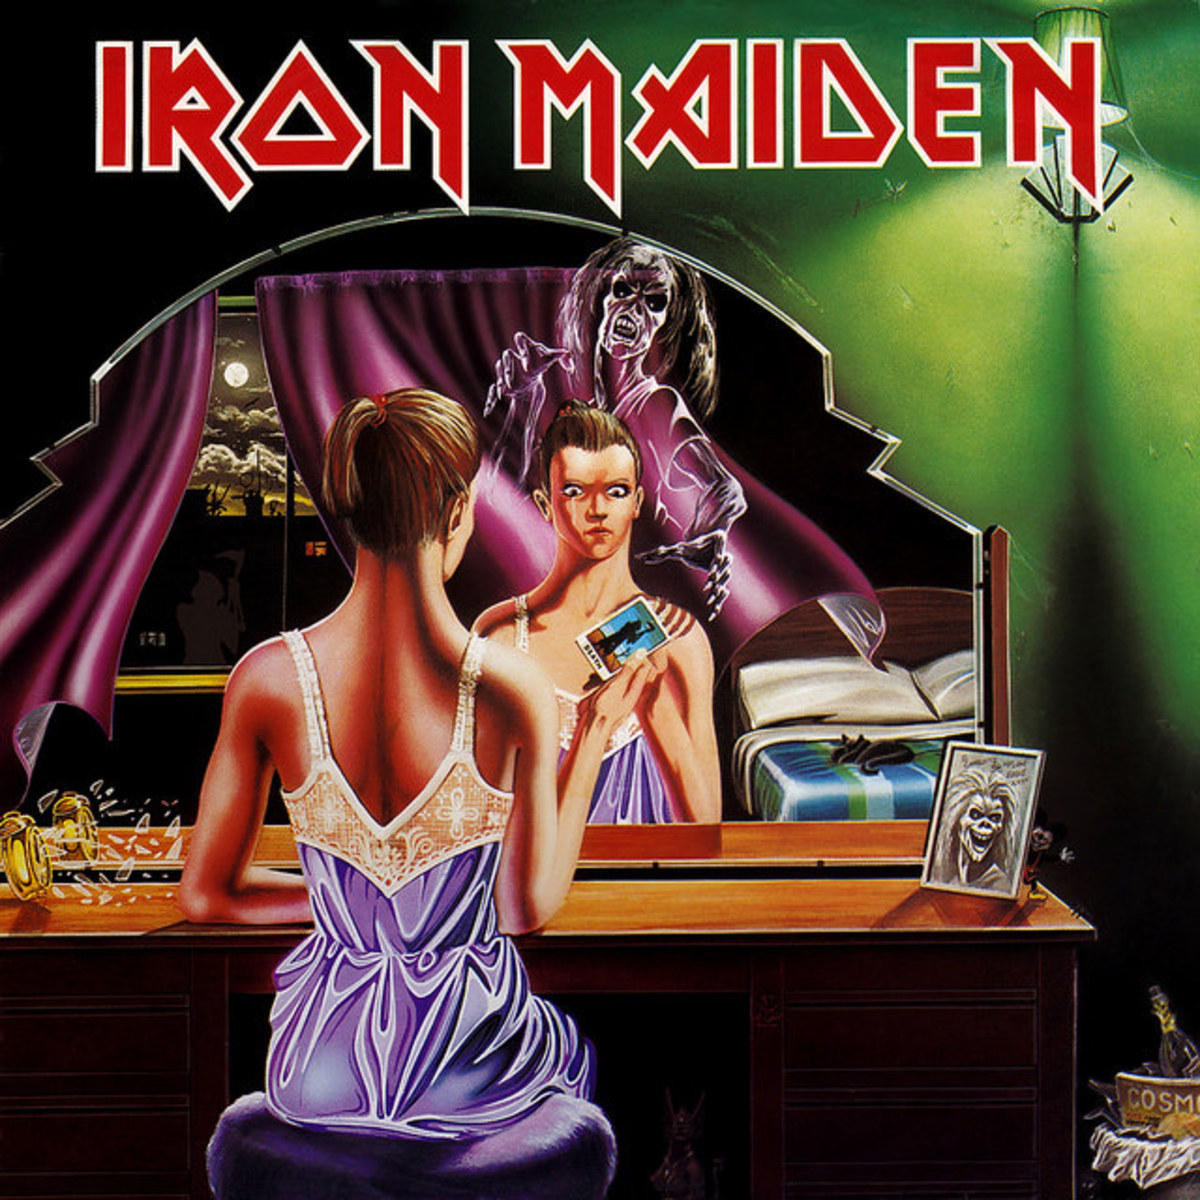 "Iron Maiden ""Twilight Zone"" 1C 052-07 462 12"" Vinyl Single German Pressing (1981) Picture Sleeve Art by Derek Riggs"